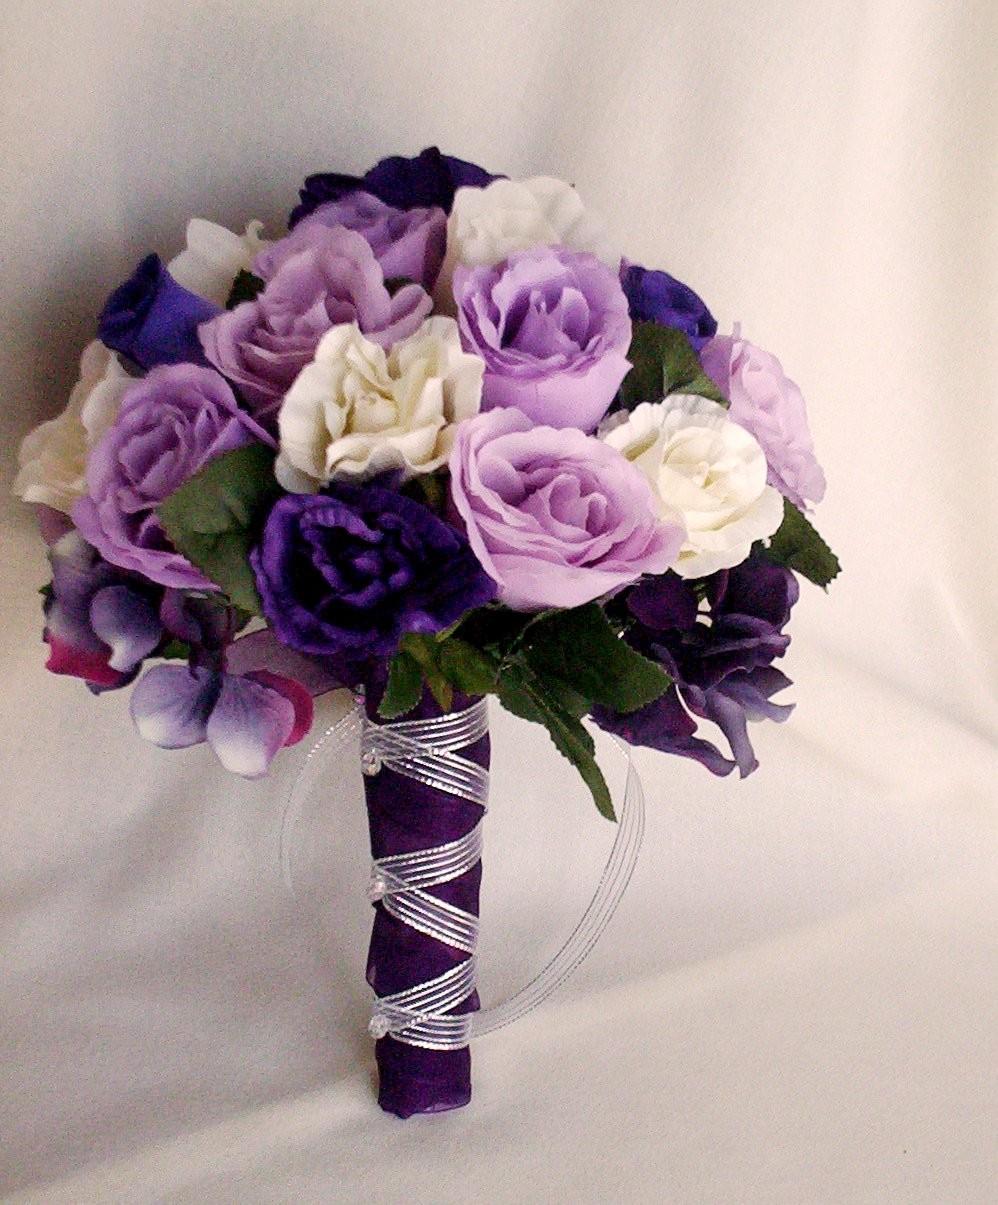 Bridal  Bridesmaids Bouquets  sng weddings  Events